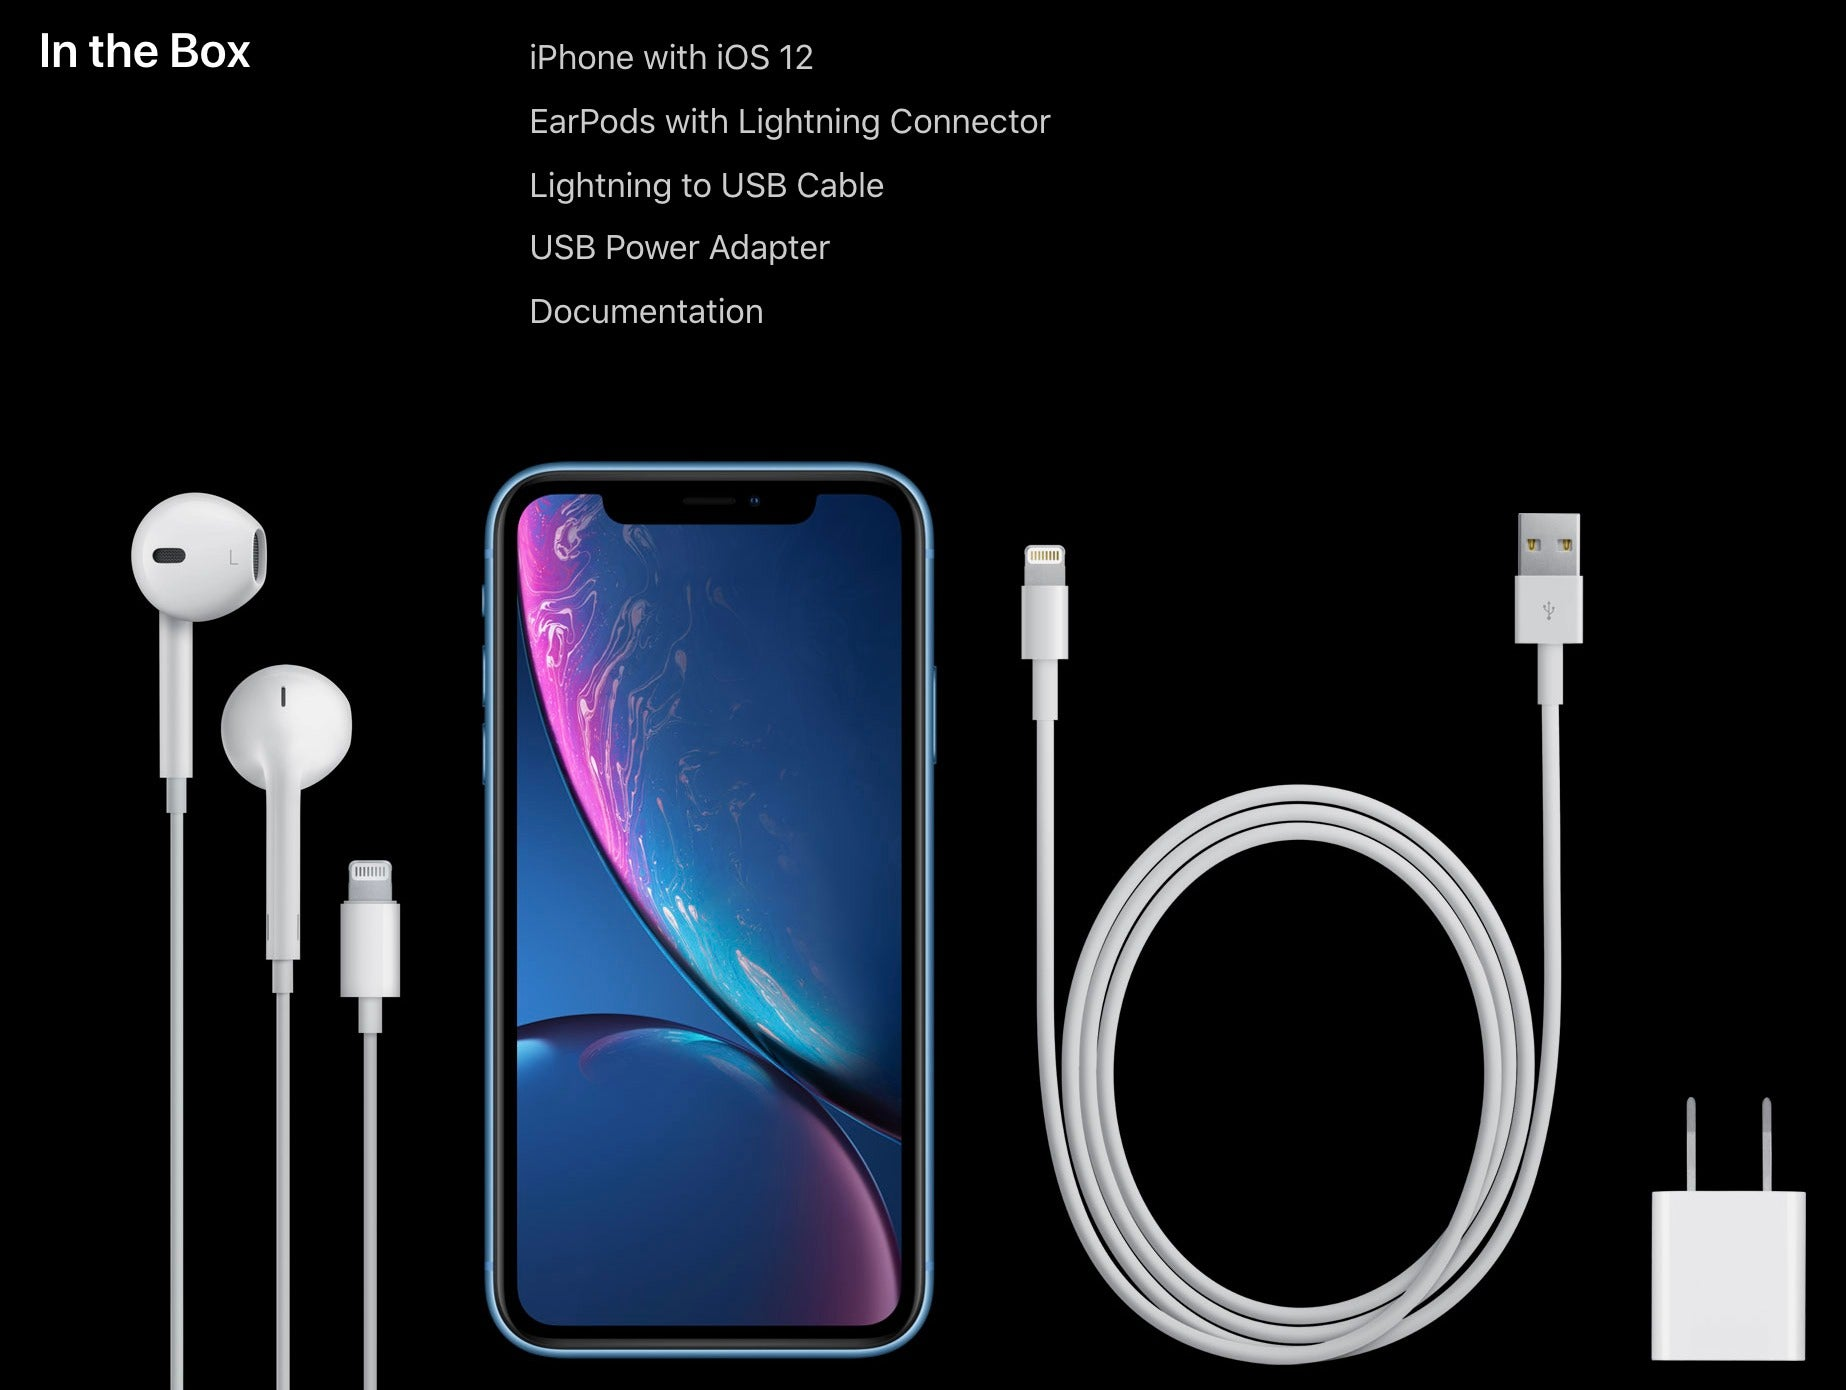 Lightning headphones apple earbuds - headphones iphone lightning